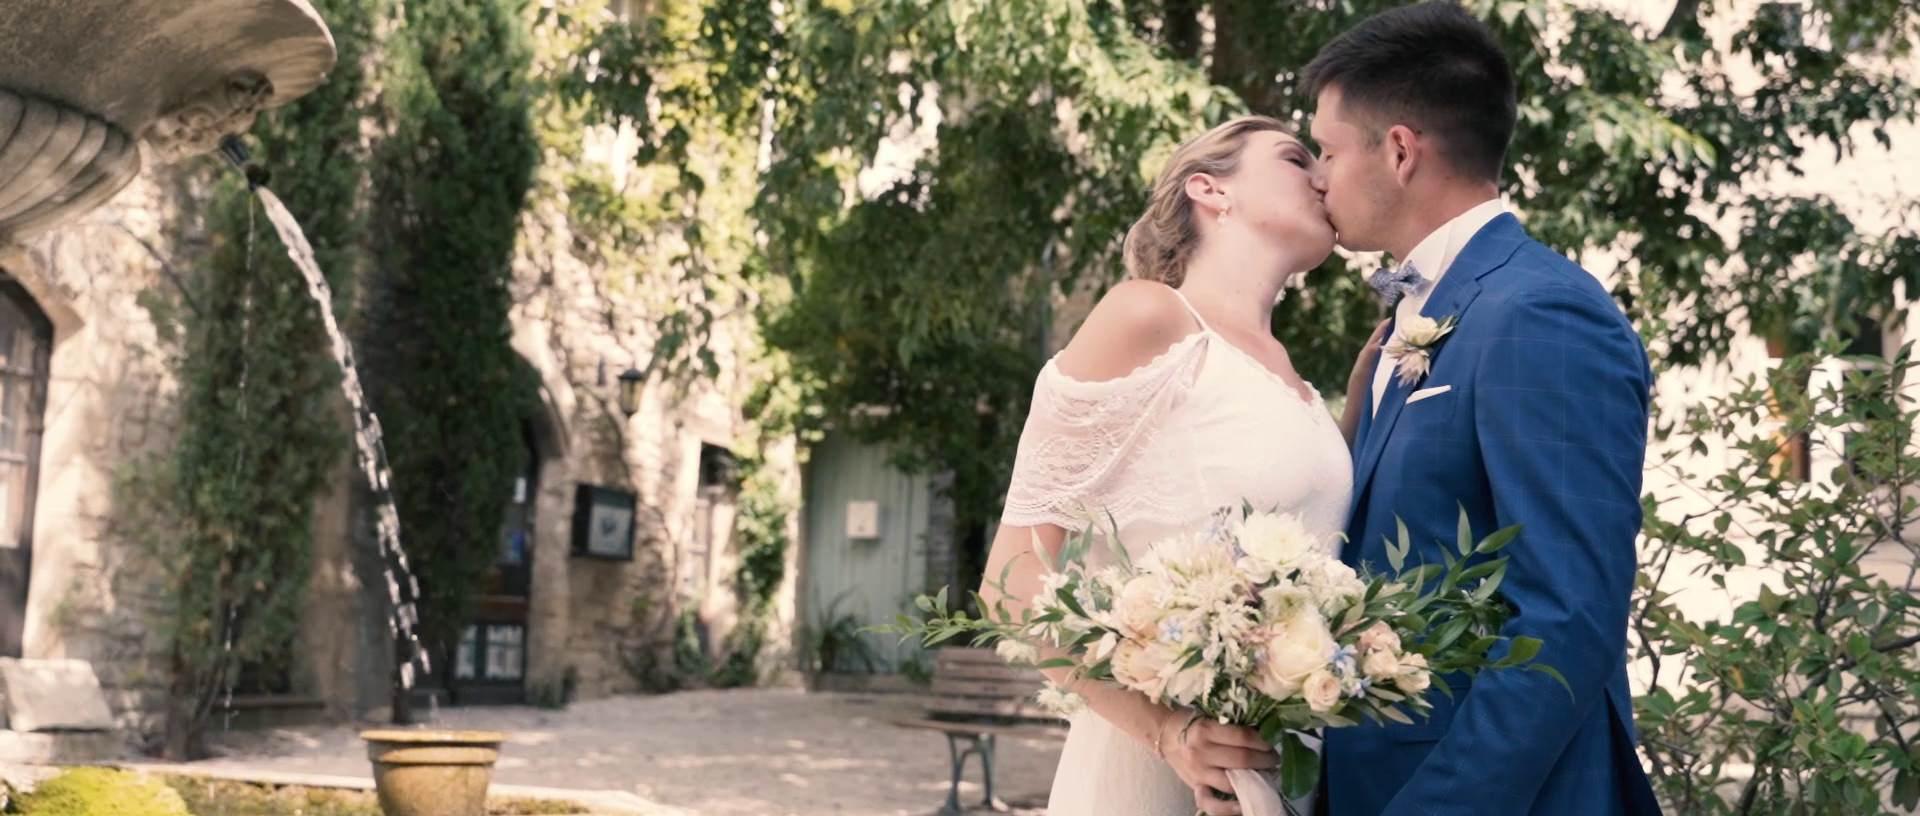 Film de Mariage Sebastien CABANES Maison Bounon